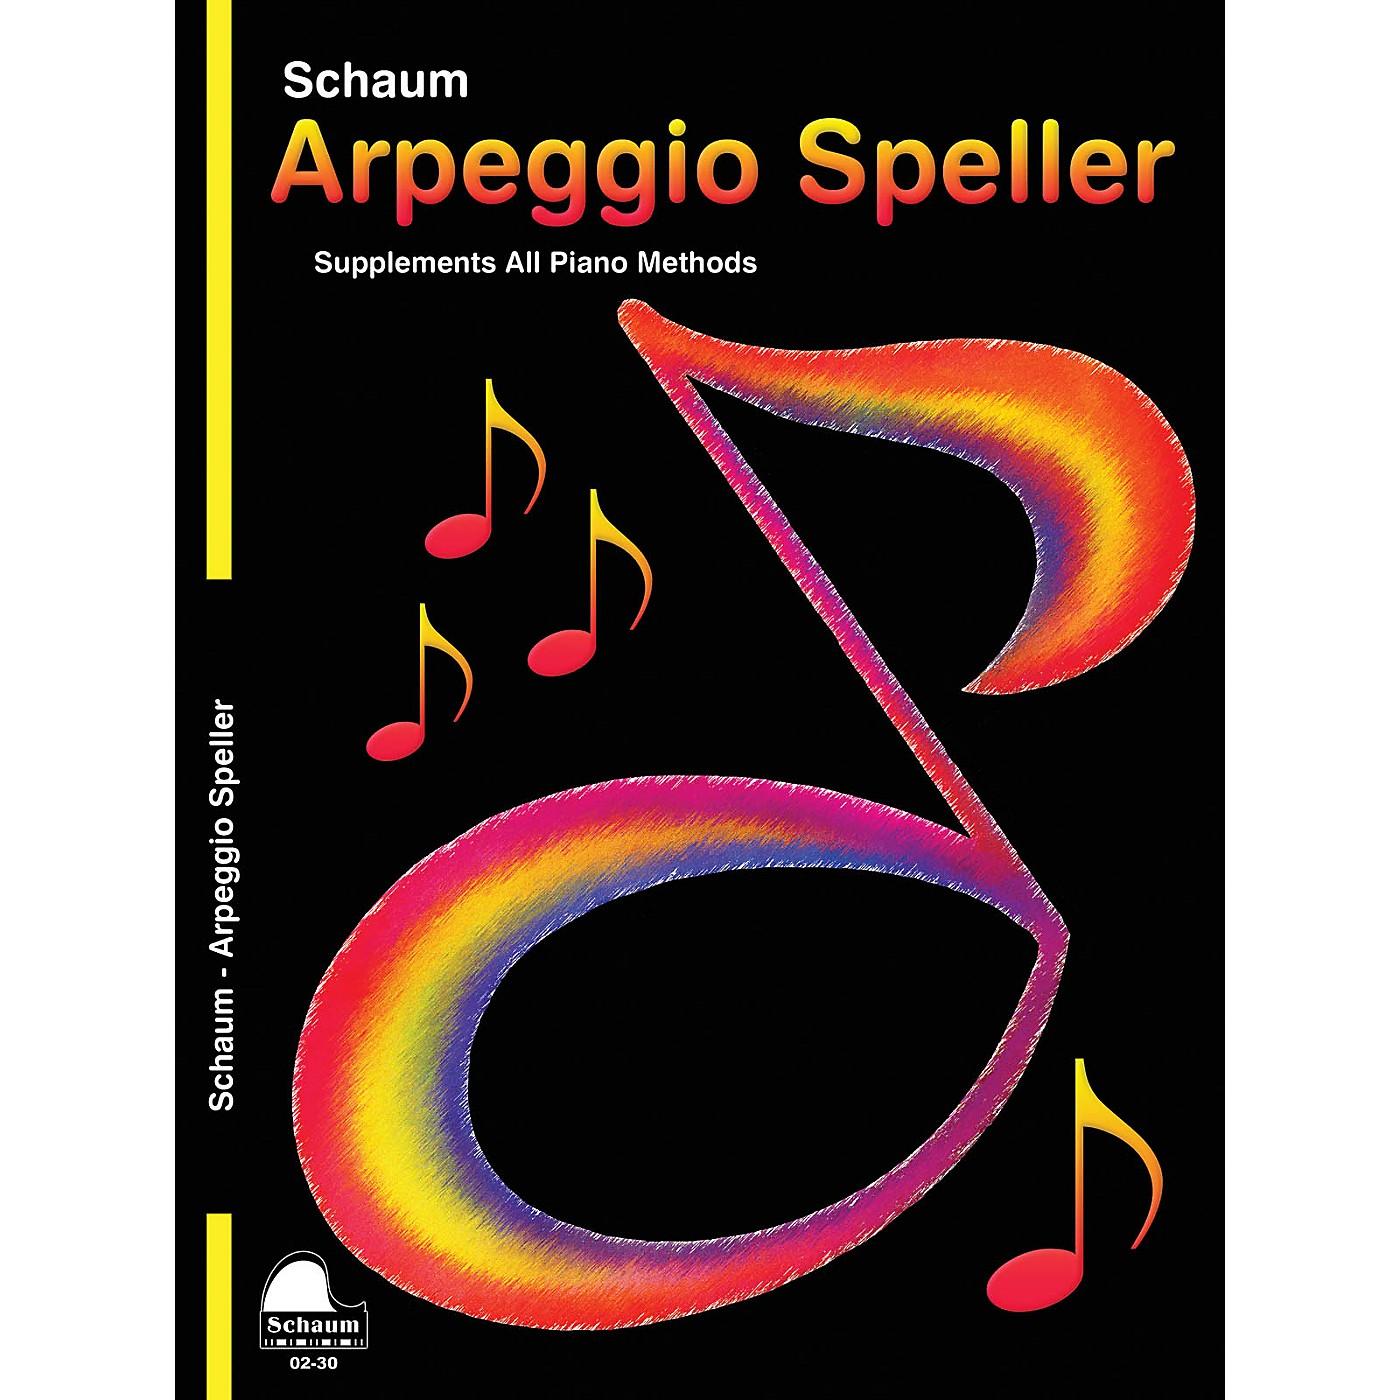 SCHAUM Keynote Arpeggio Speller Educational Piano Series Softcover thumbnail